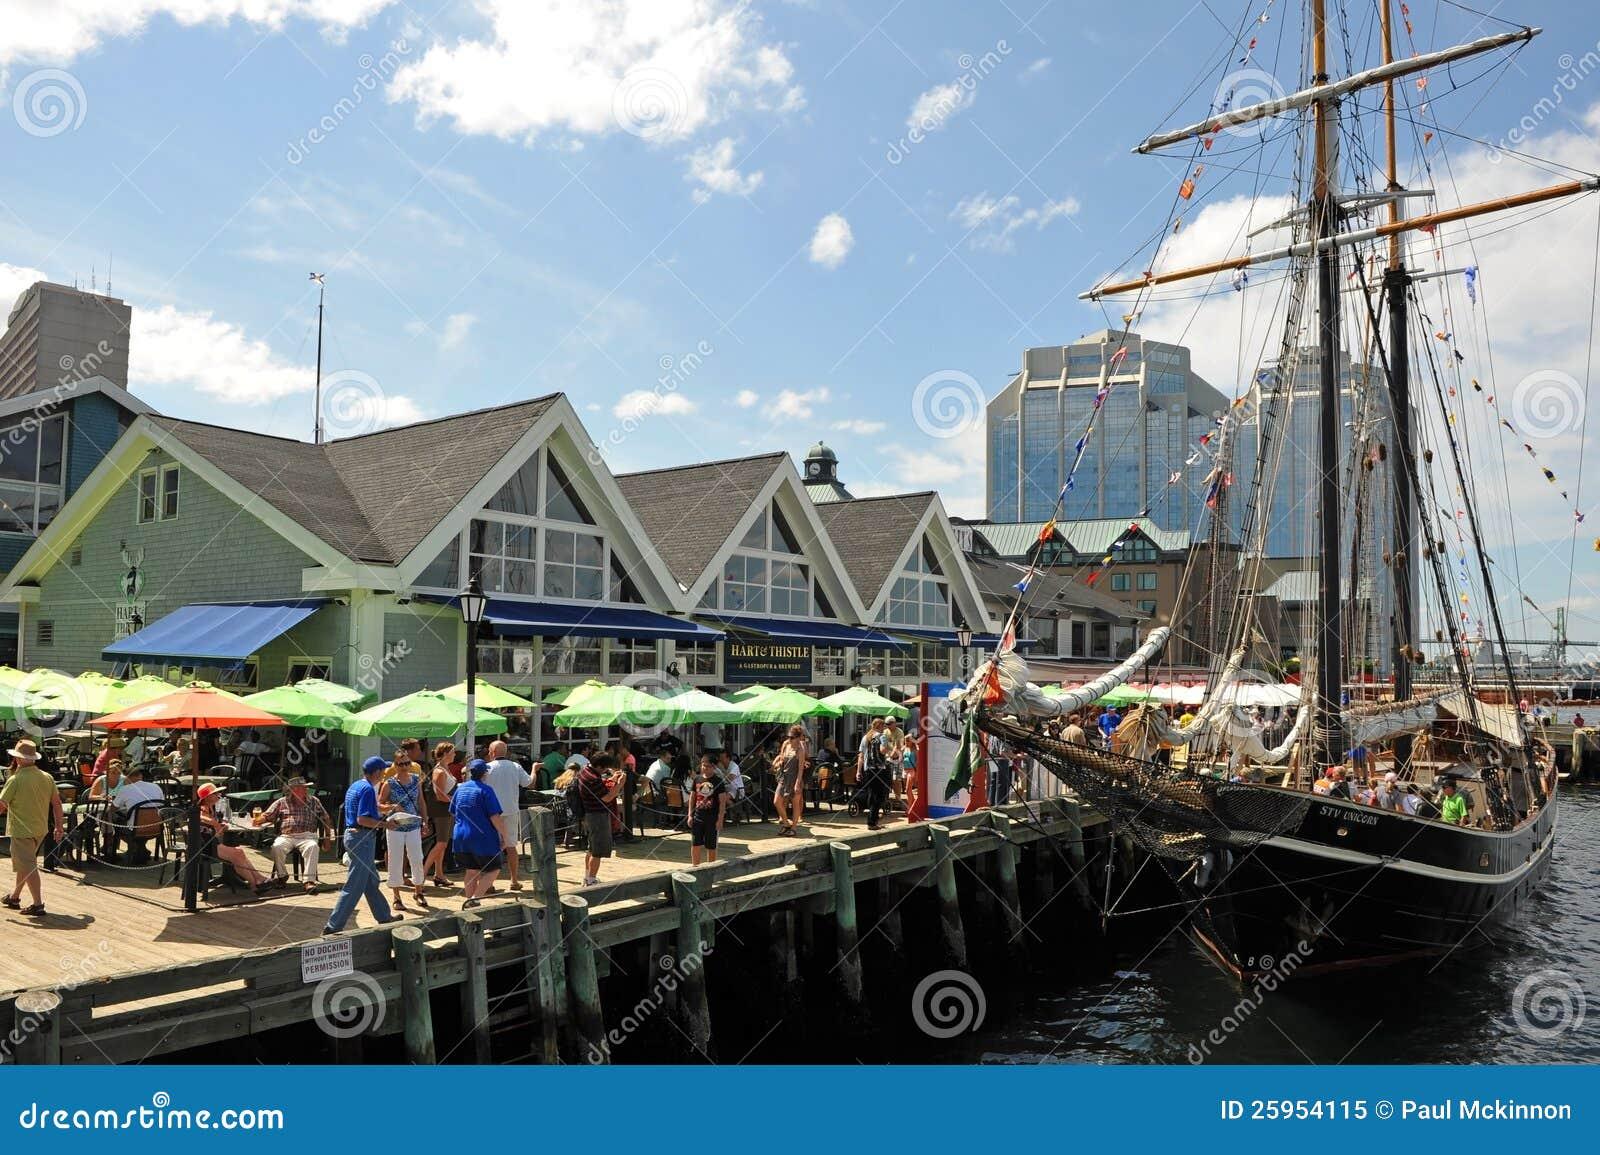 Tall Ships event in Halifax, Nova Scotia